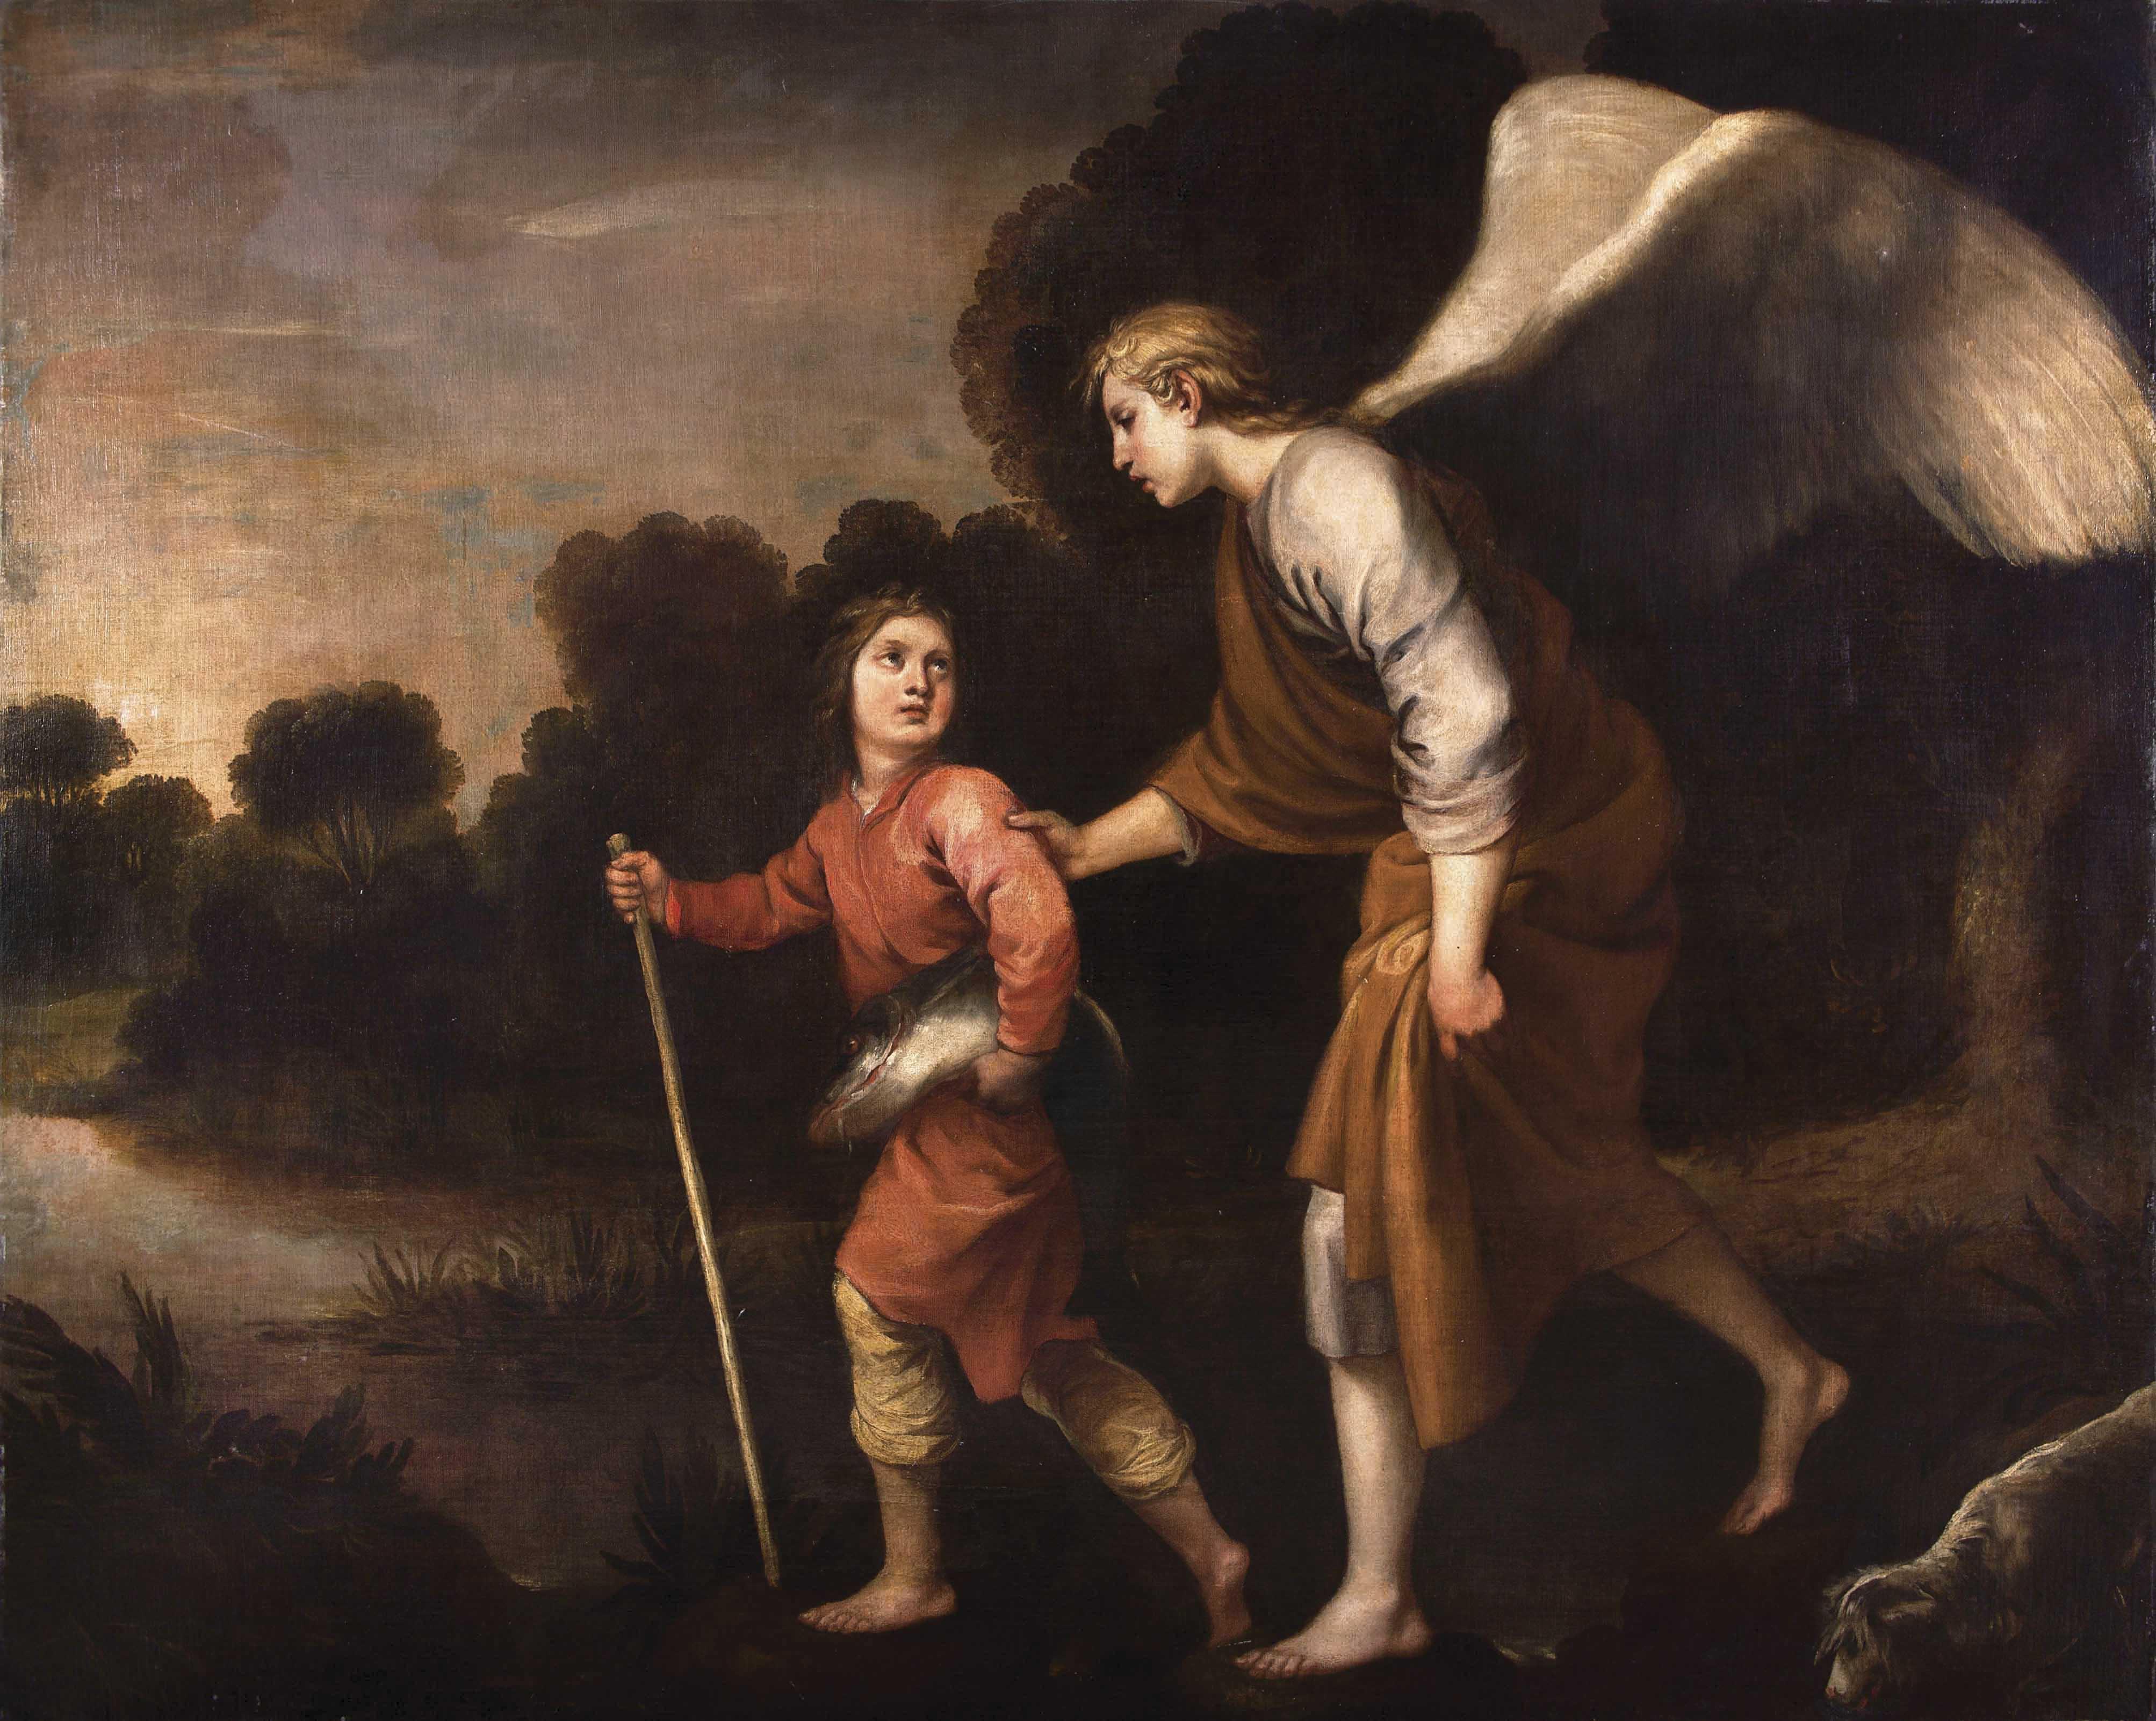 Tobias-y-el-ángel